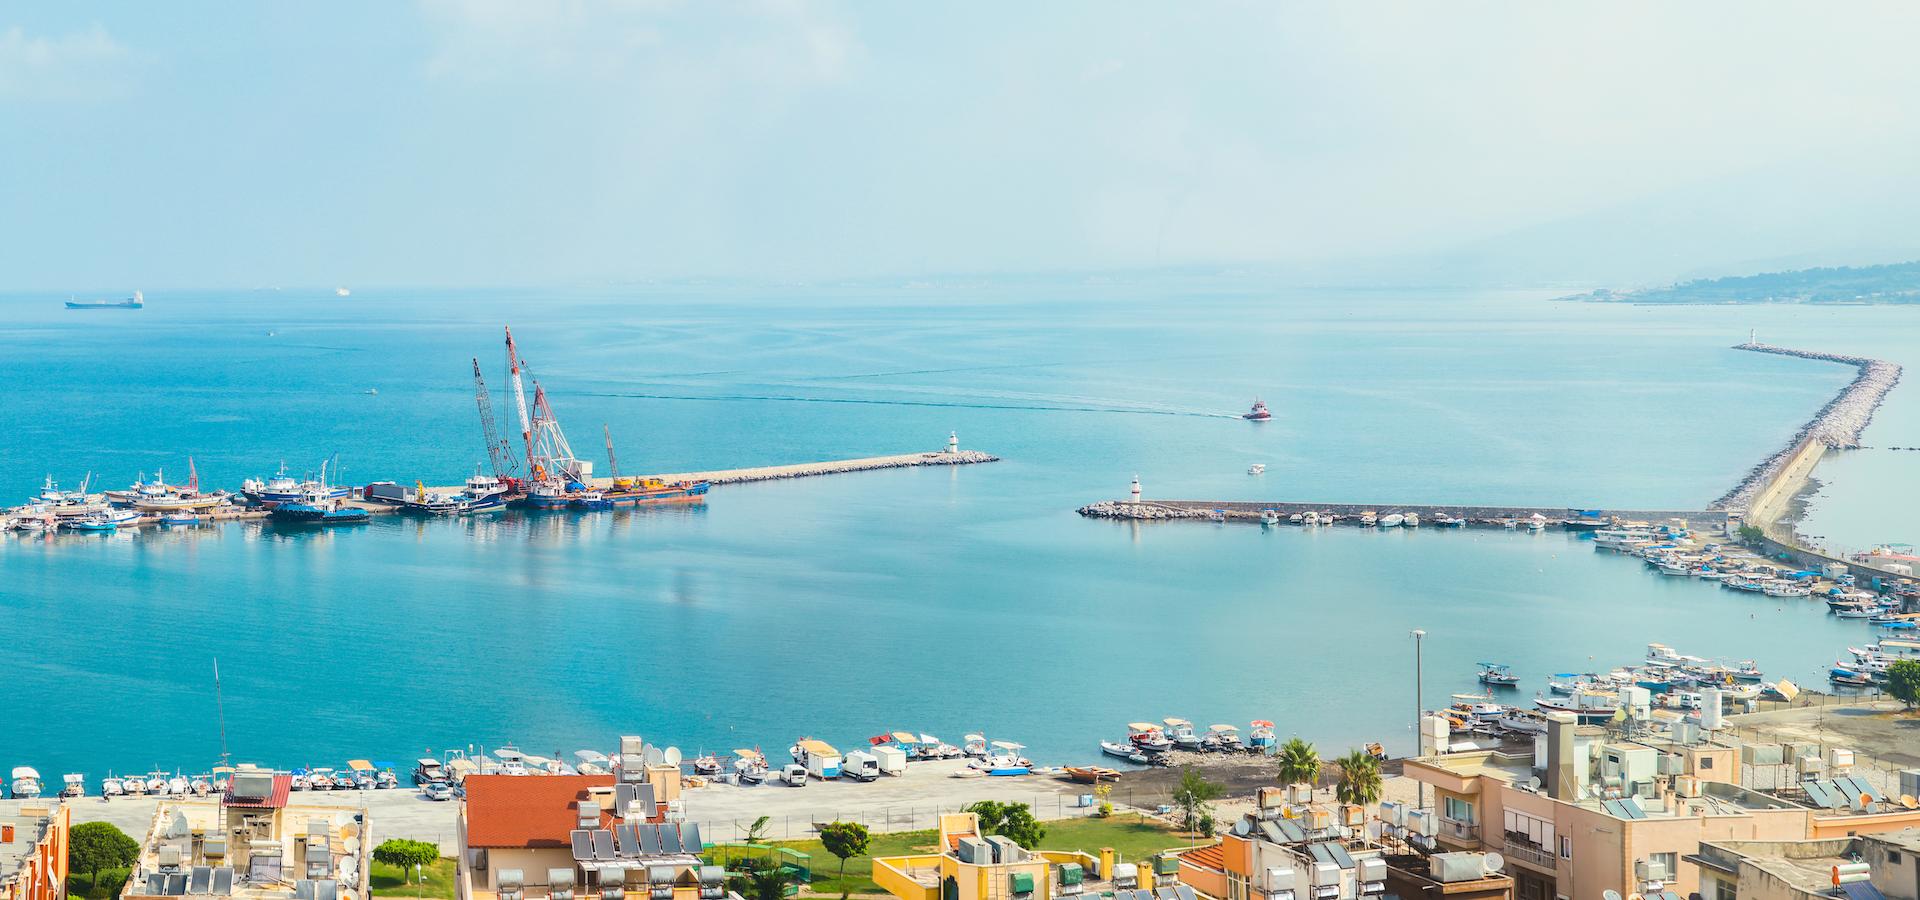 Peer-to-peer advisory in Antakya, Hatay Province, Mediterranean Region, Turkey